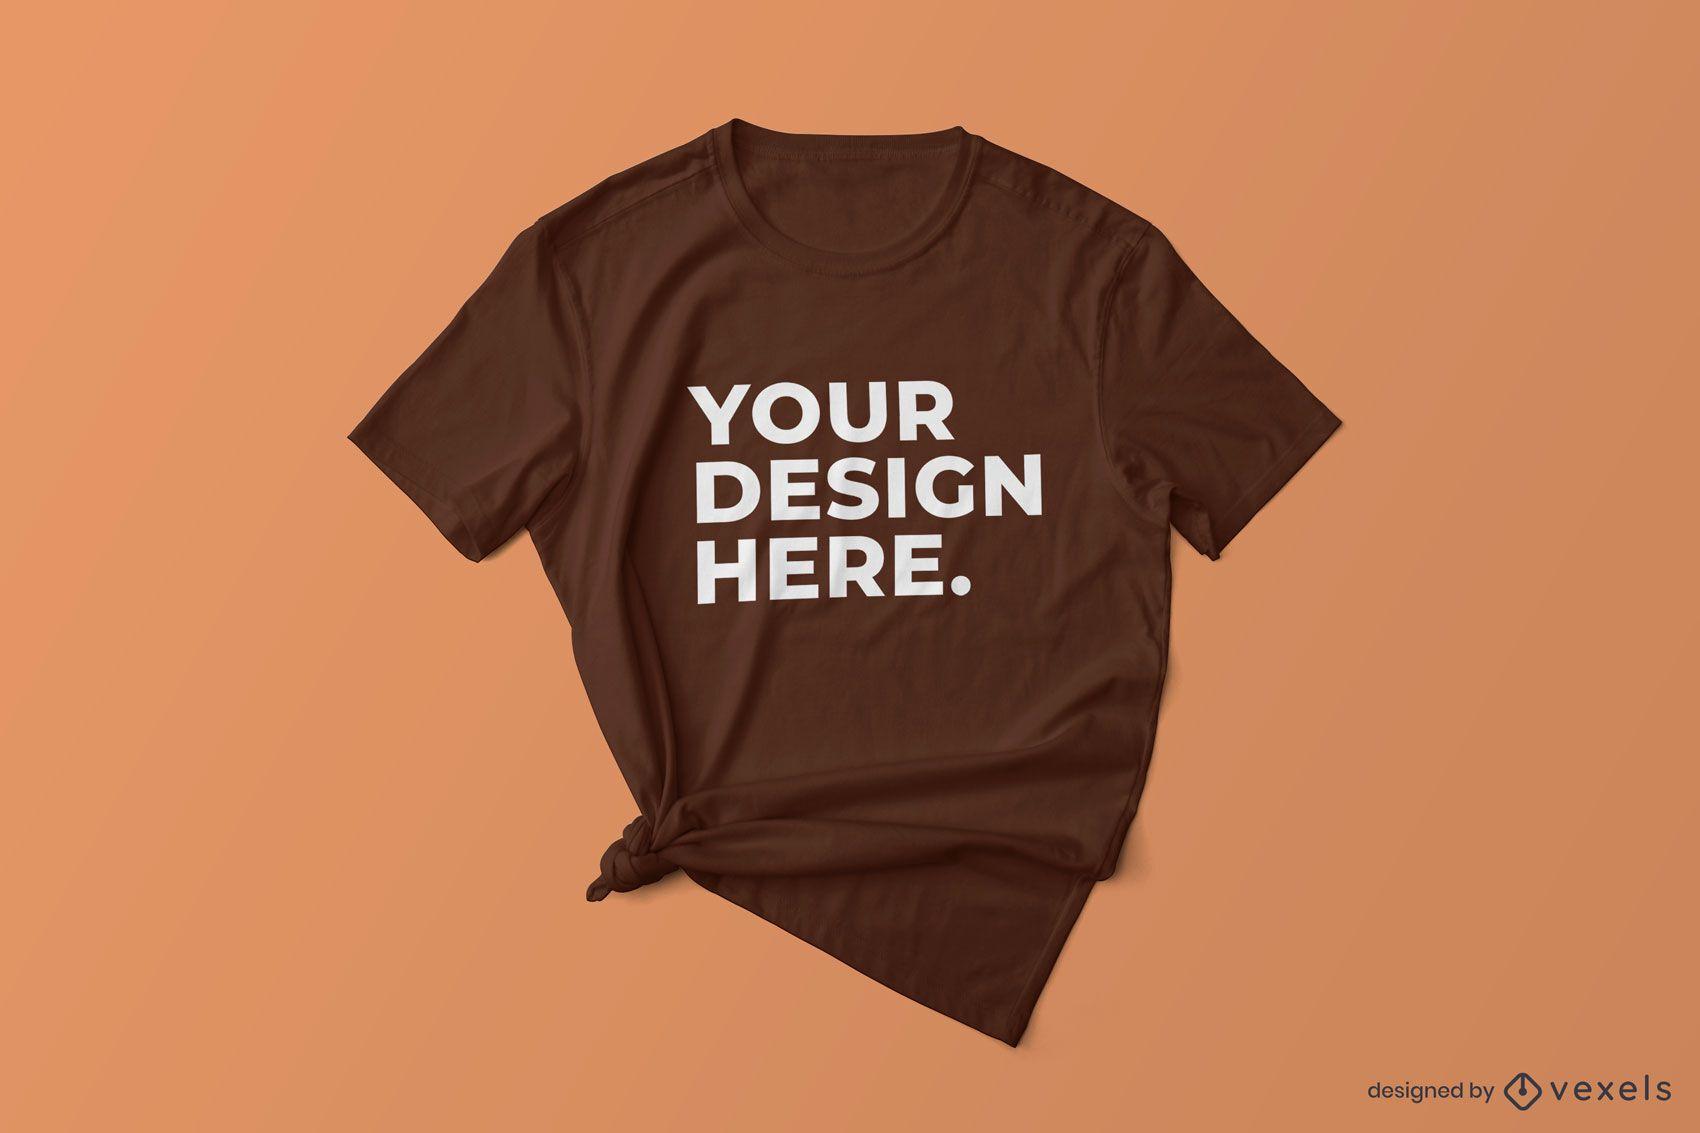 Knotted t-shirt mockup design